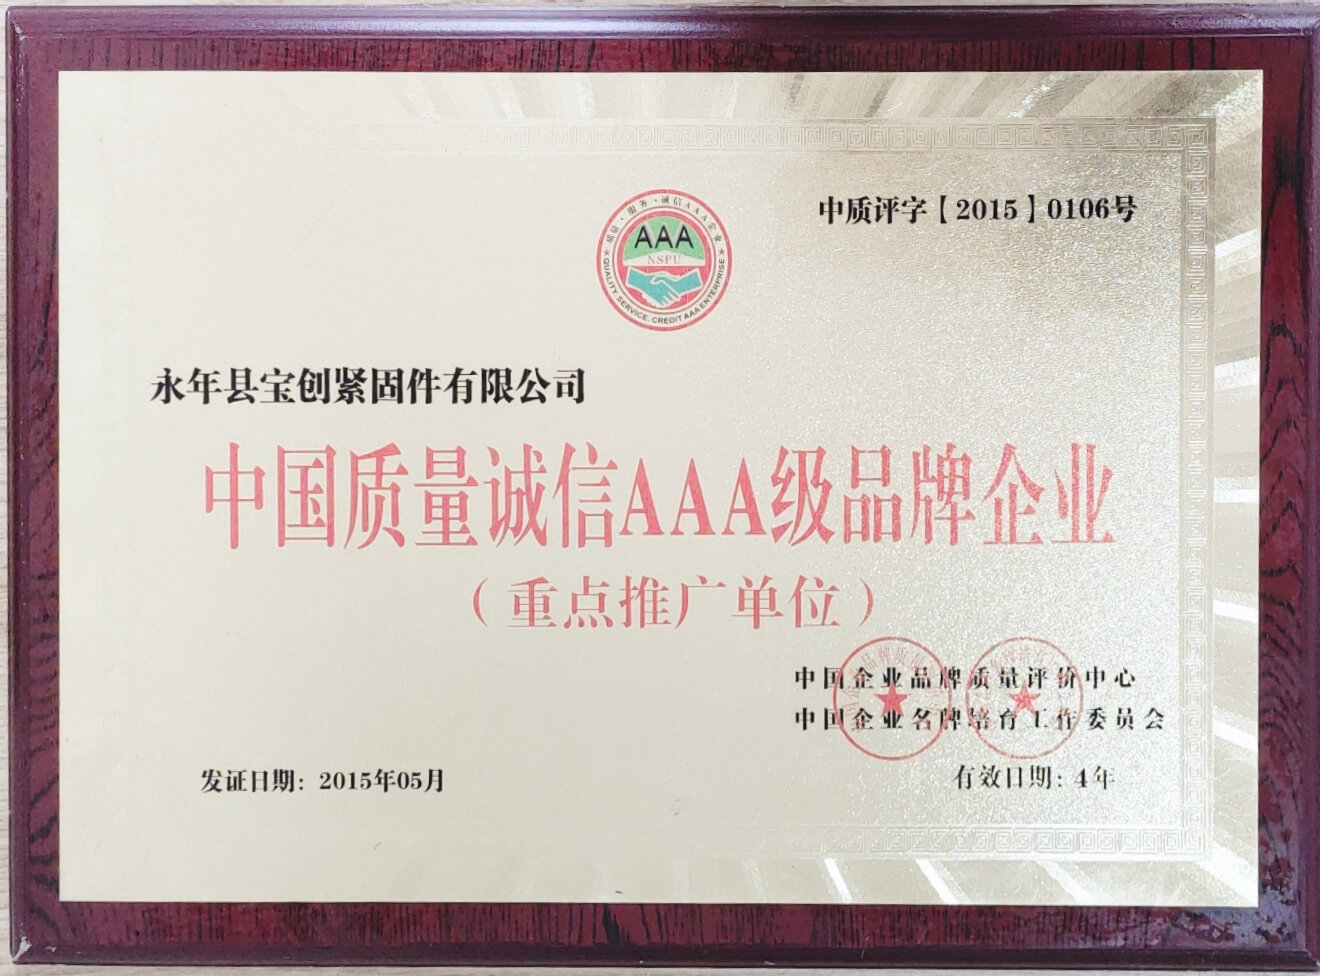 China Quality Integrity AAA Brand Enterprise